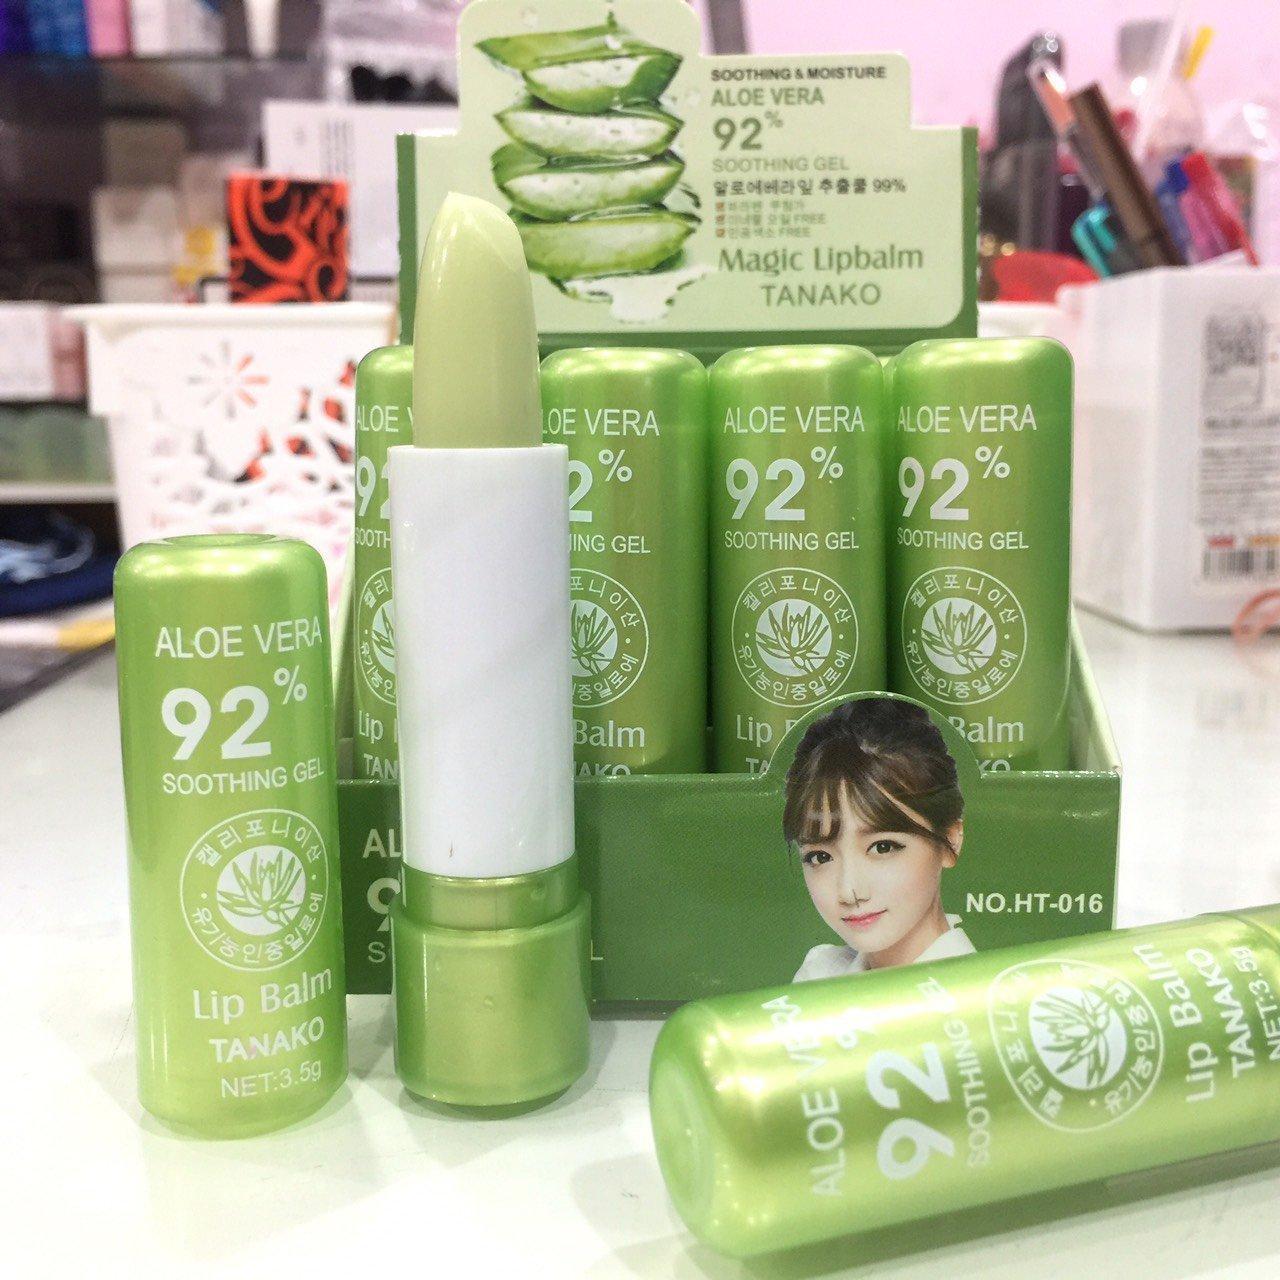 Kelebihan Tanako Lip Balm Aloe Vera 99 Magic Lipstick Moisturizing Bioaqua 1 Pcs 5